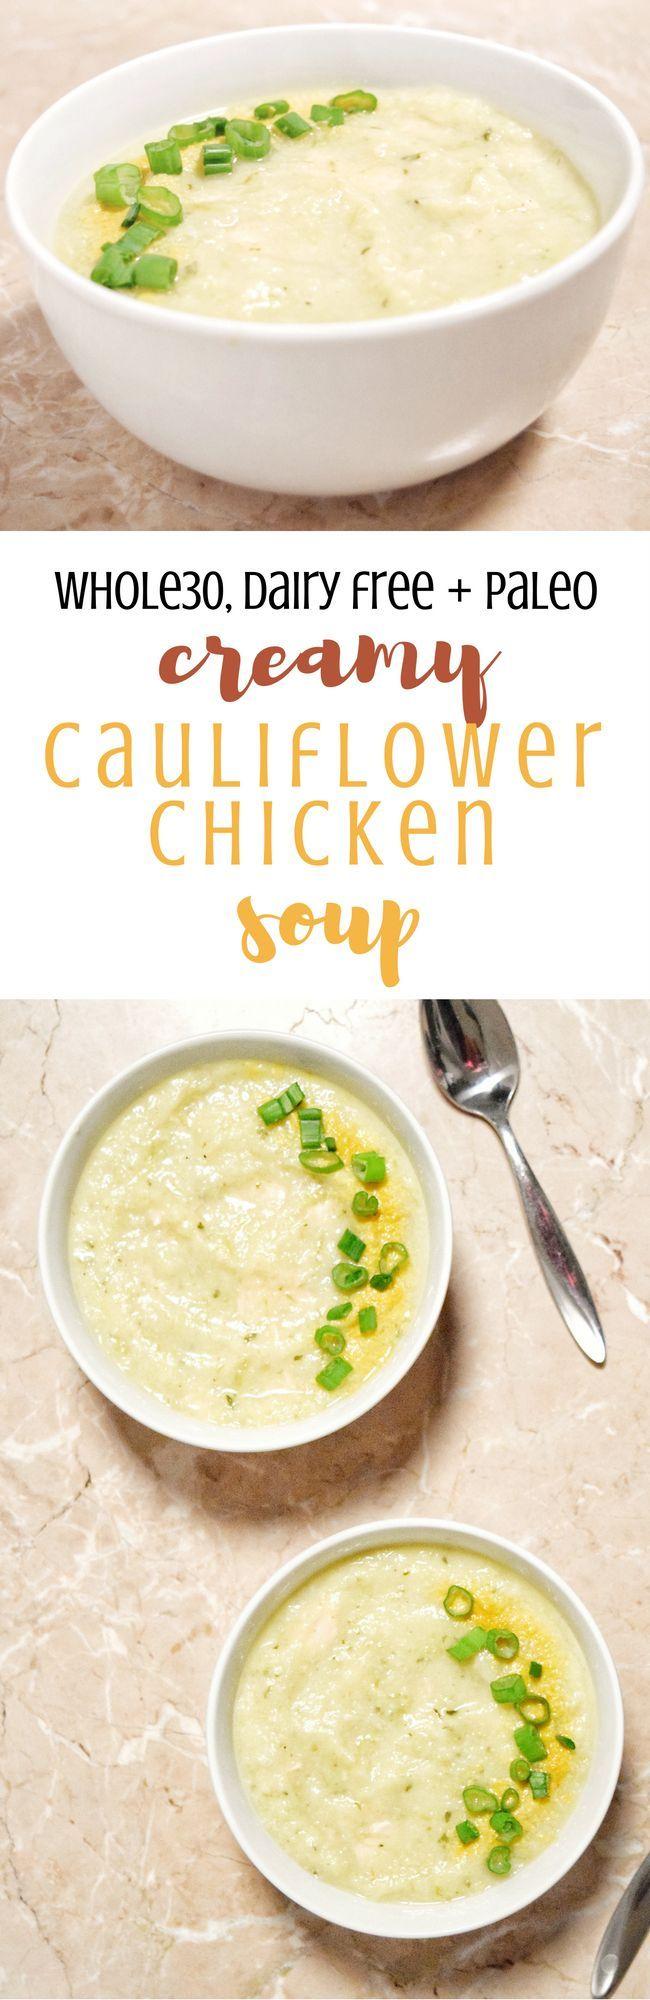 Creamy Cauliflower Chicken Soup (Dairy Free, Whole30, Paleo) | Personally Paleo